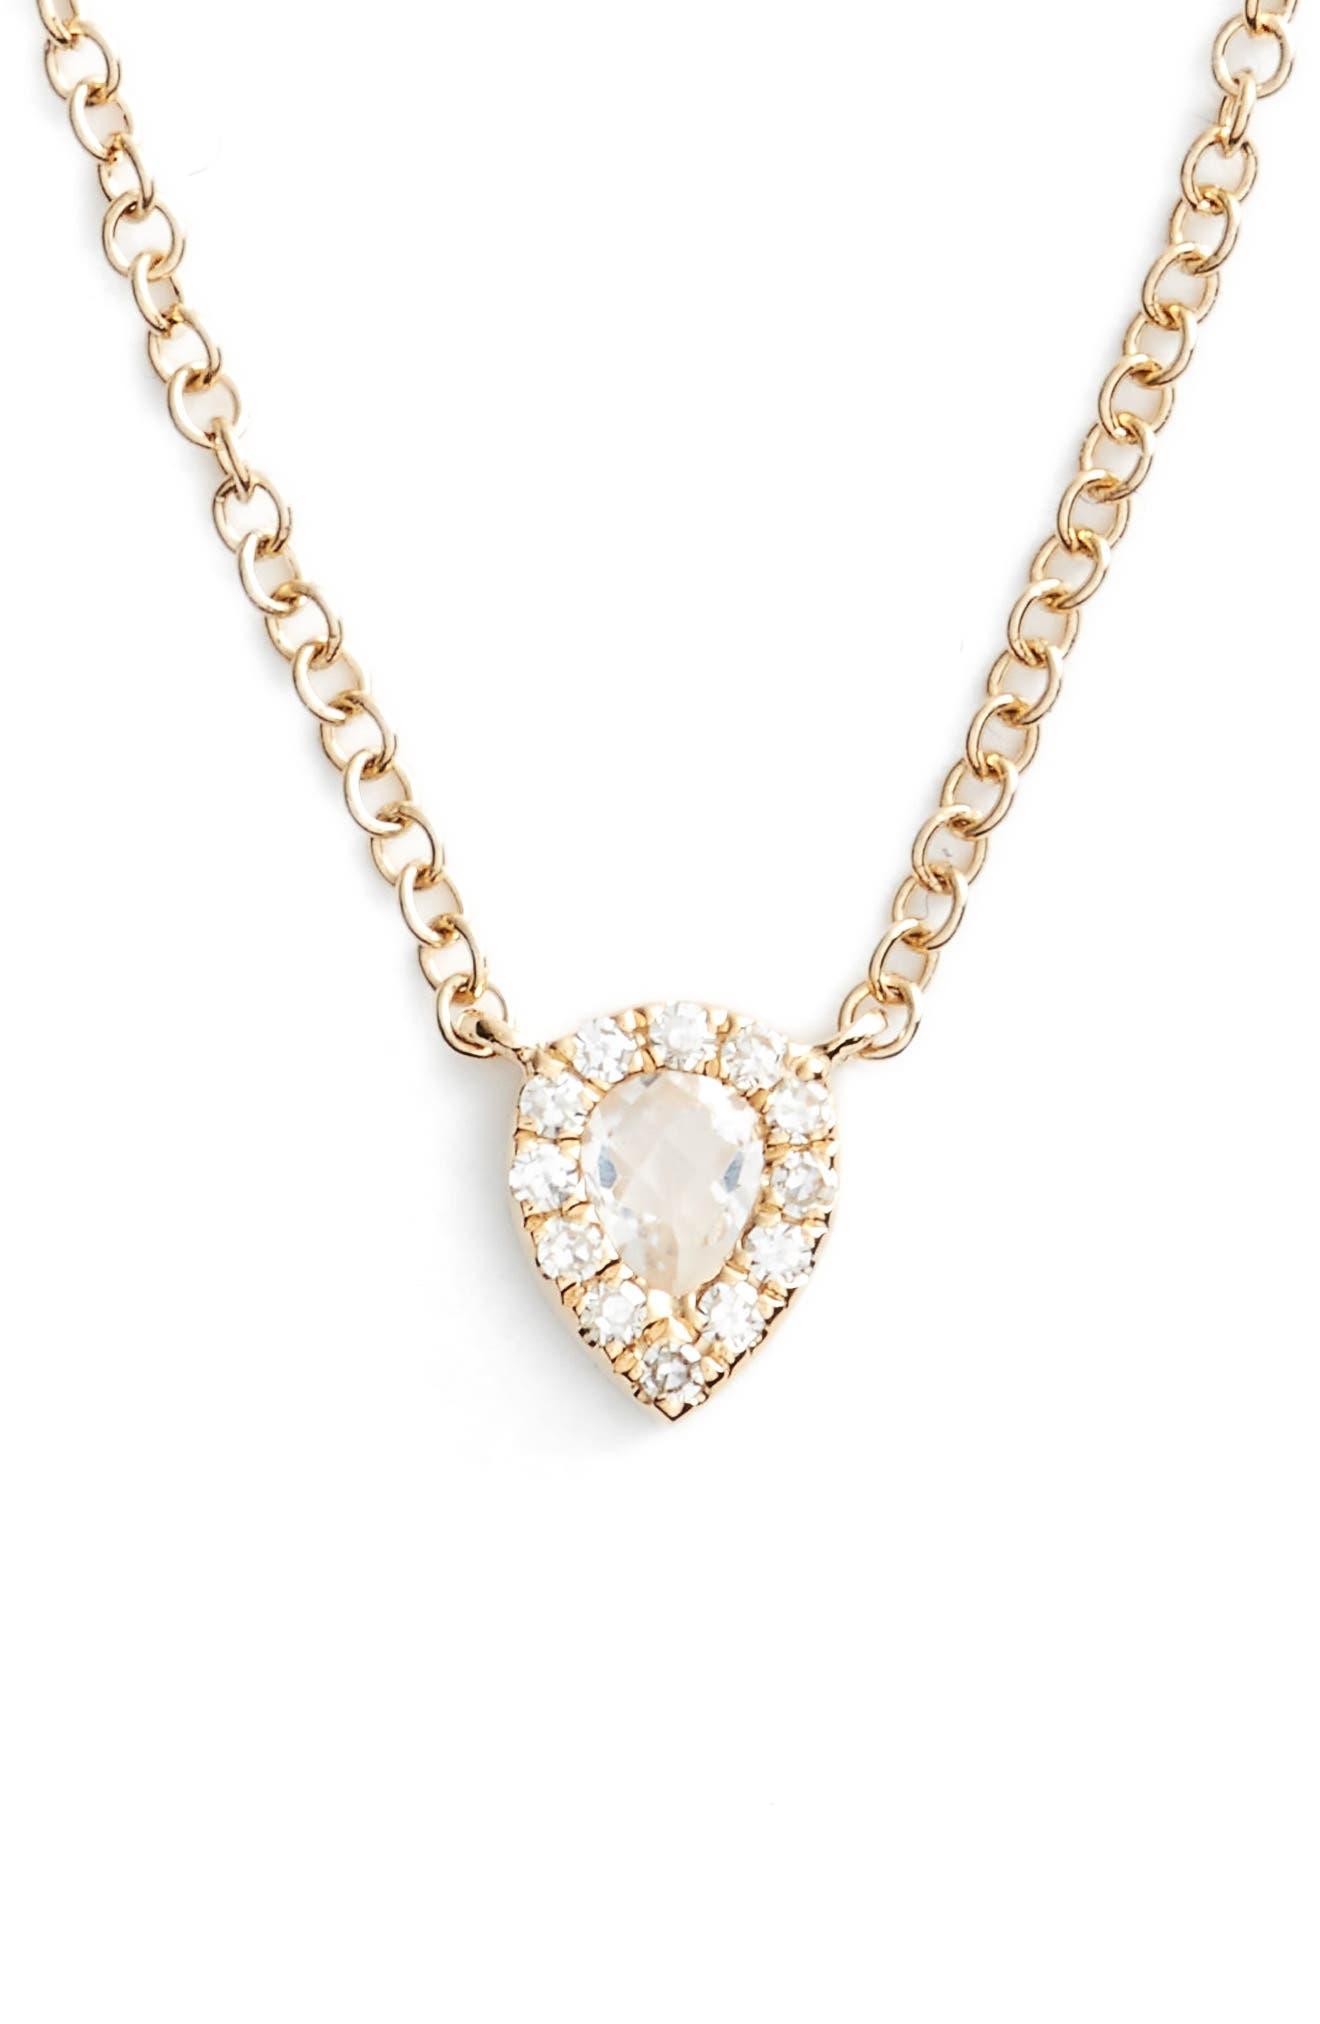 Diamond & Topaz Teardrop Pendant Necklace,                             Main thumbnail 1, color,                             YELLOW GOLD